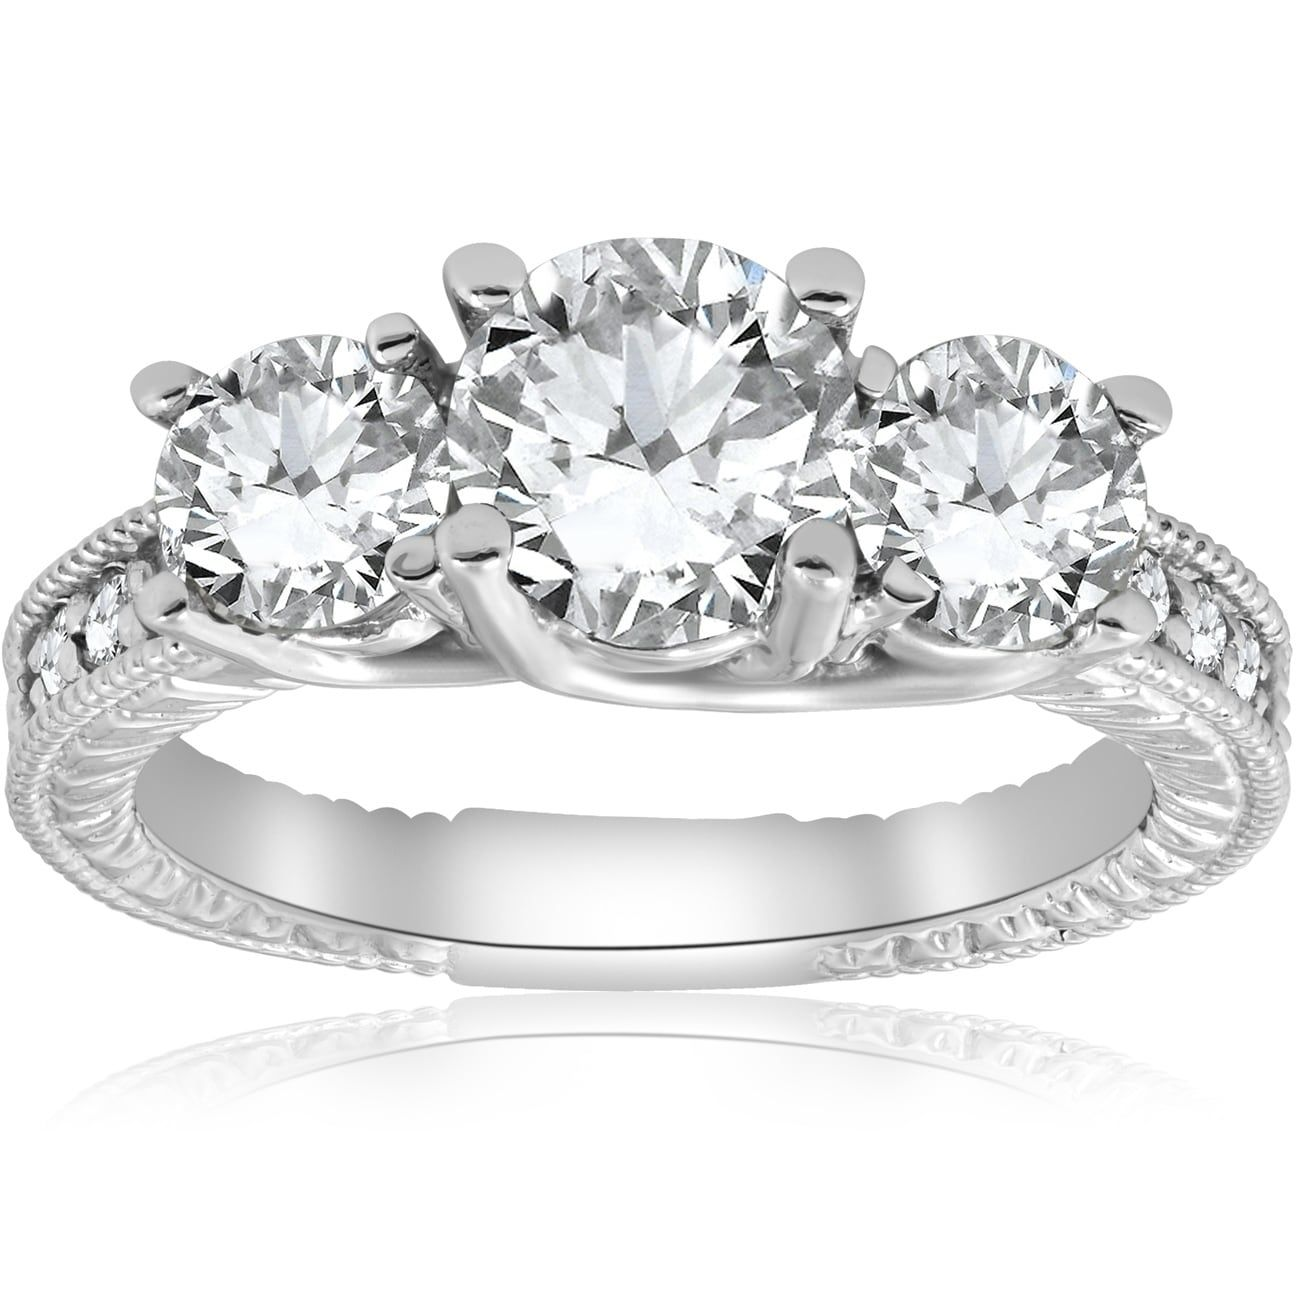 5e597eae0f91f Bliss 14K White Gold 2 1/2 ct TDW Diamond Clarity Enhanced Three ...